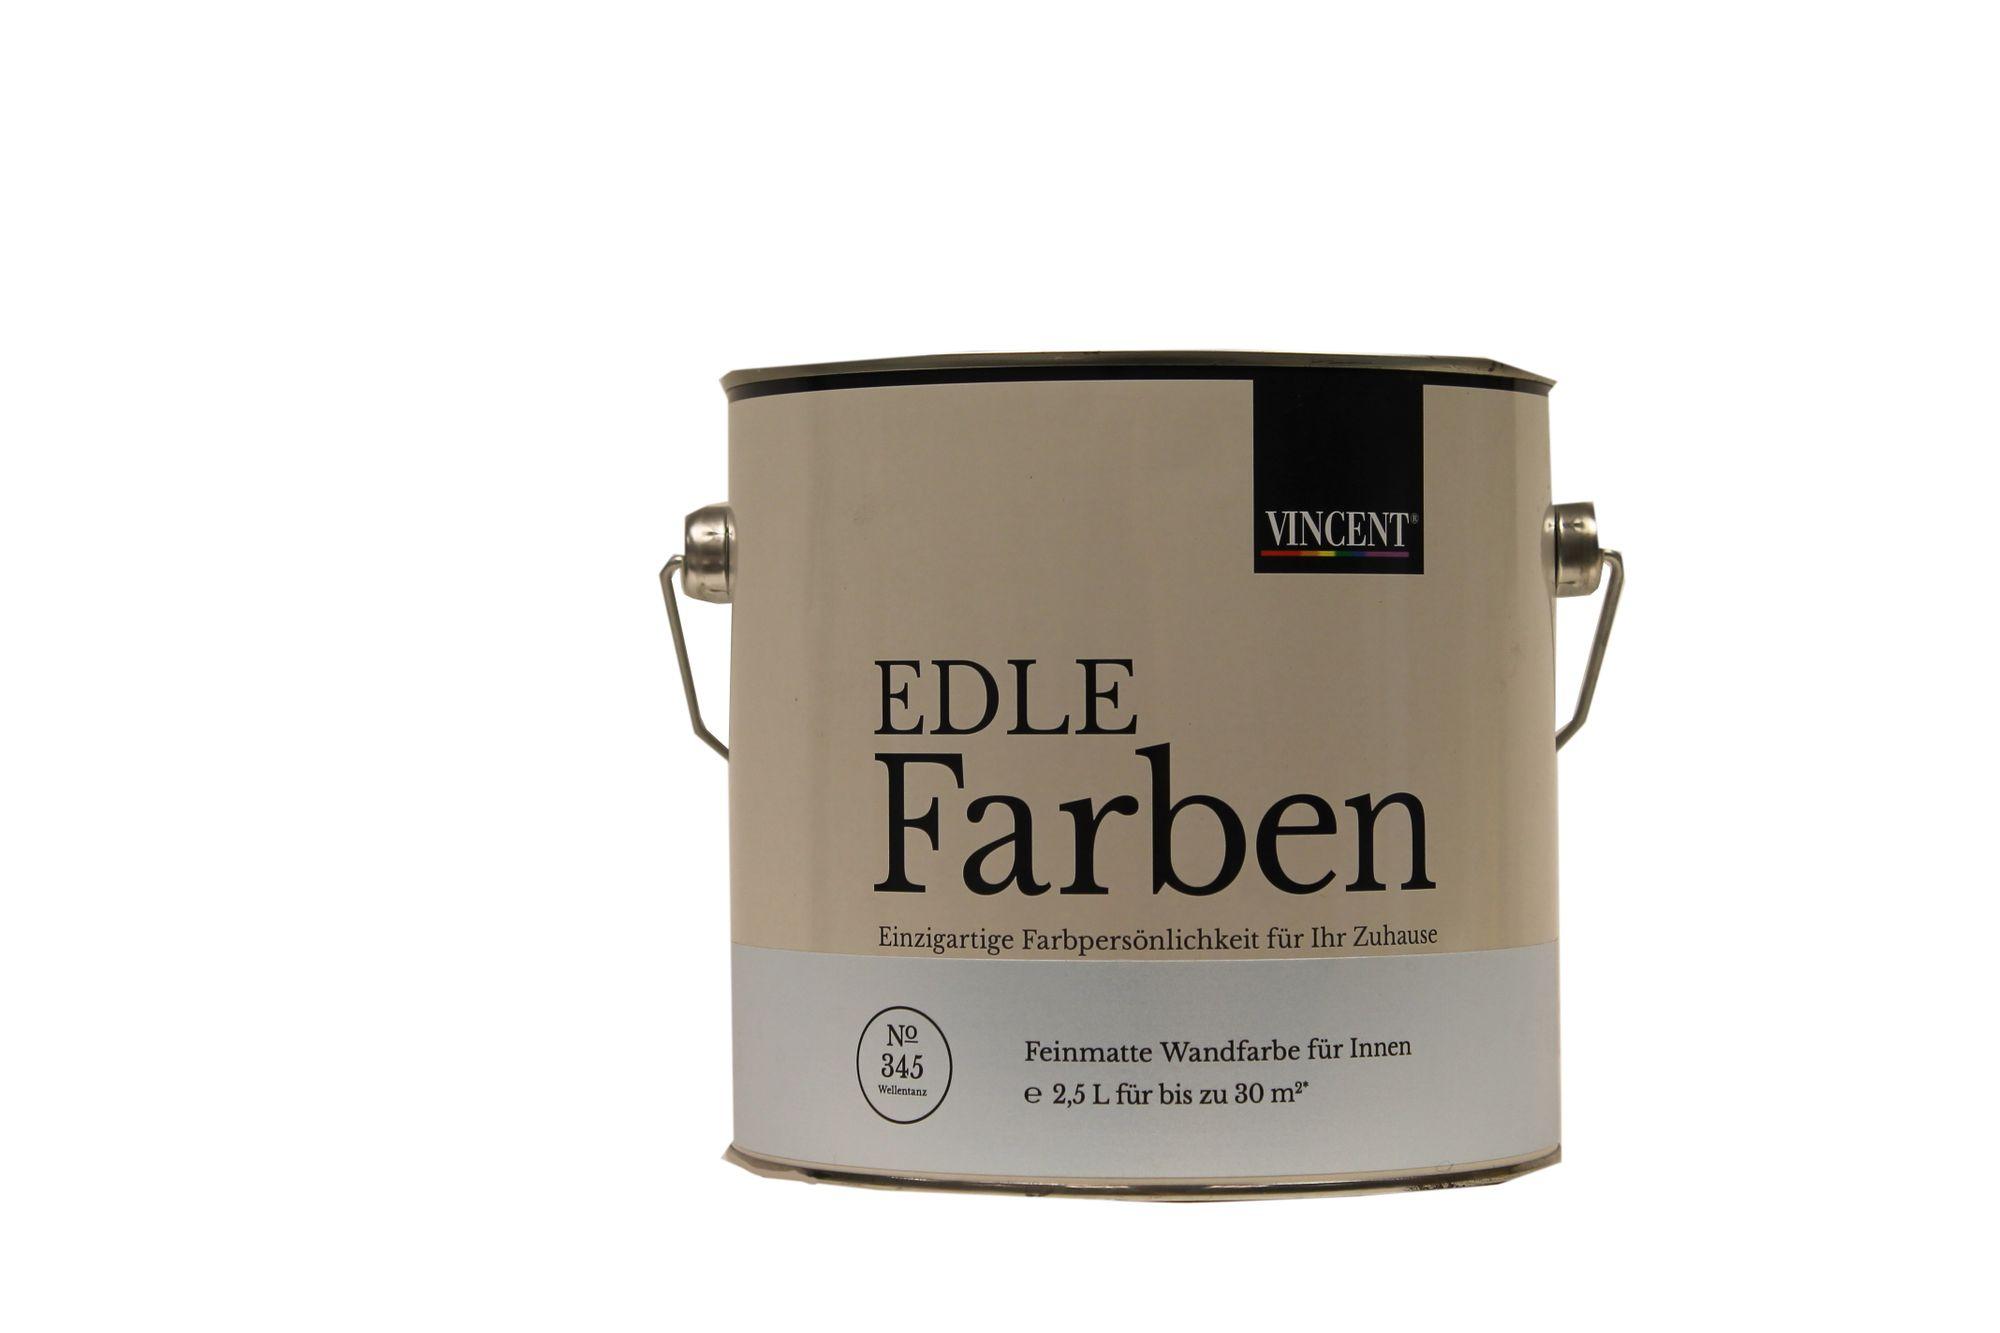 Vincent Edle Farben Feinmatte Wandfarbe innen 2,5 Liter